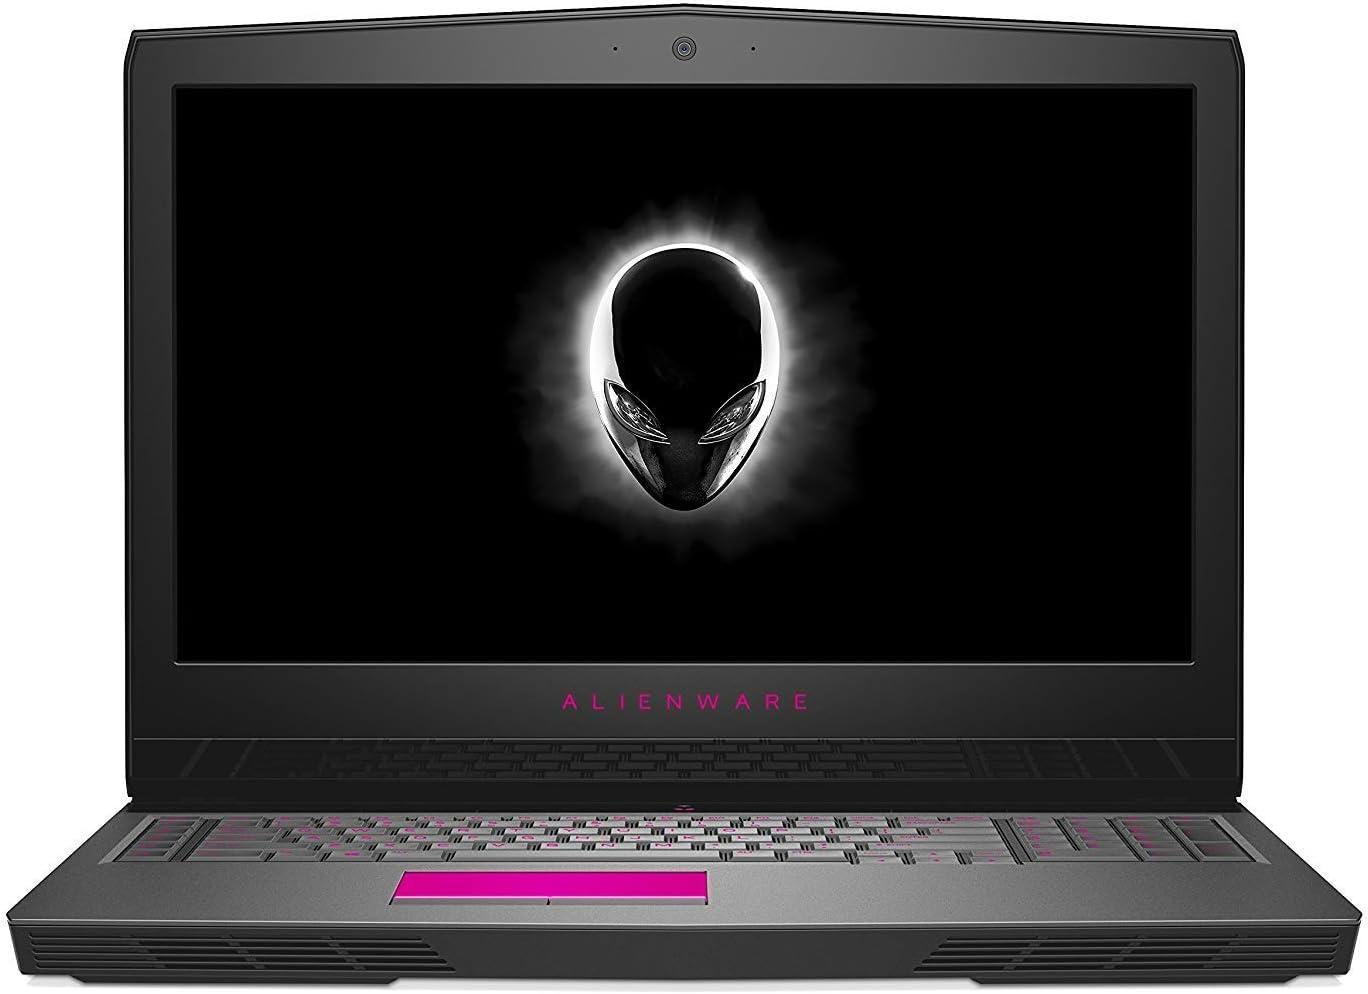 Alienware 17R4 17 R4 QHD Non-Touch i7-7820HK 32GB RAM 1TB HDD + 256GB SSD GTX 1070 8GB Windows 10 Home (Renewed)